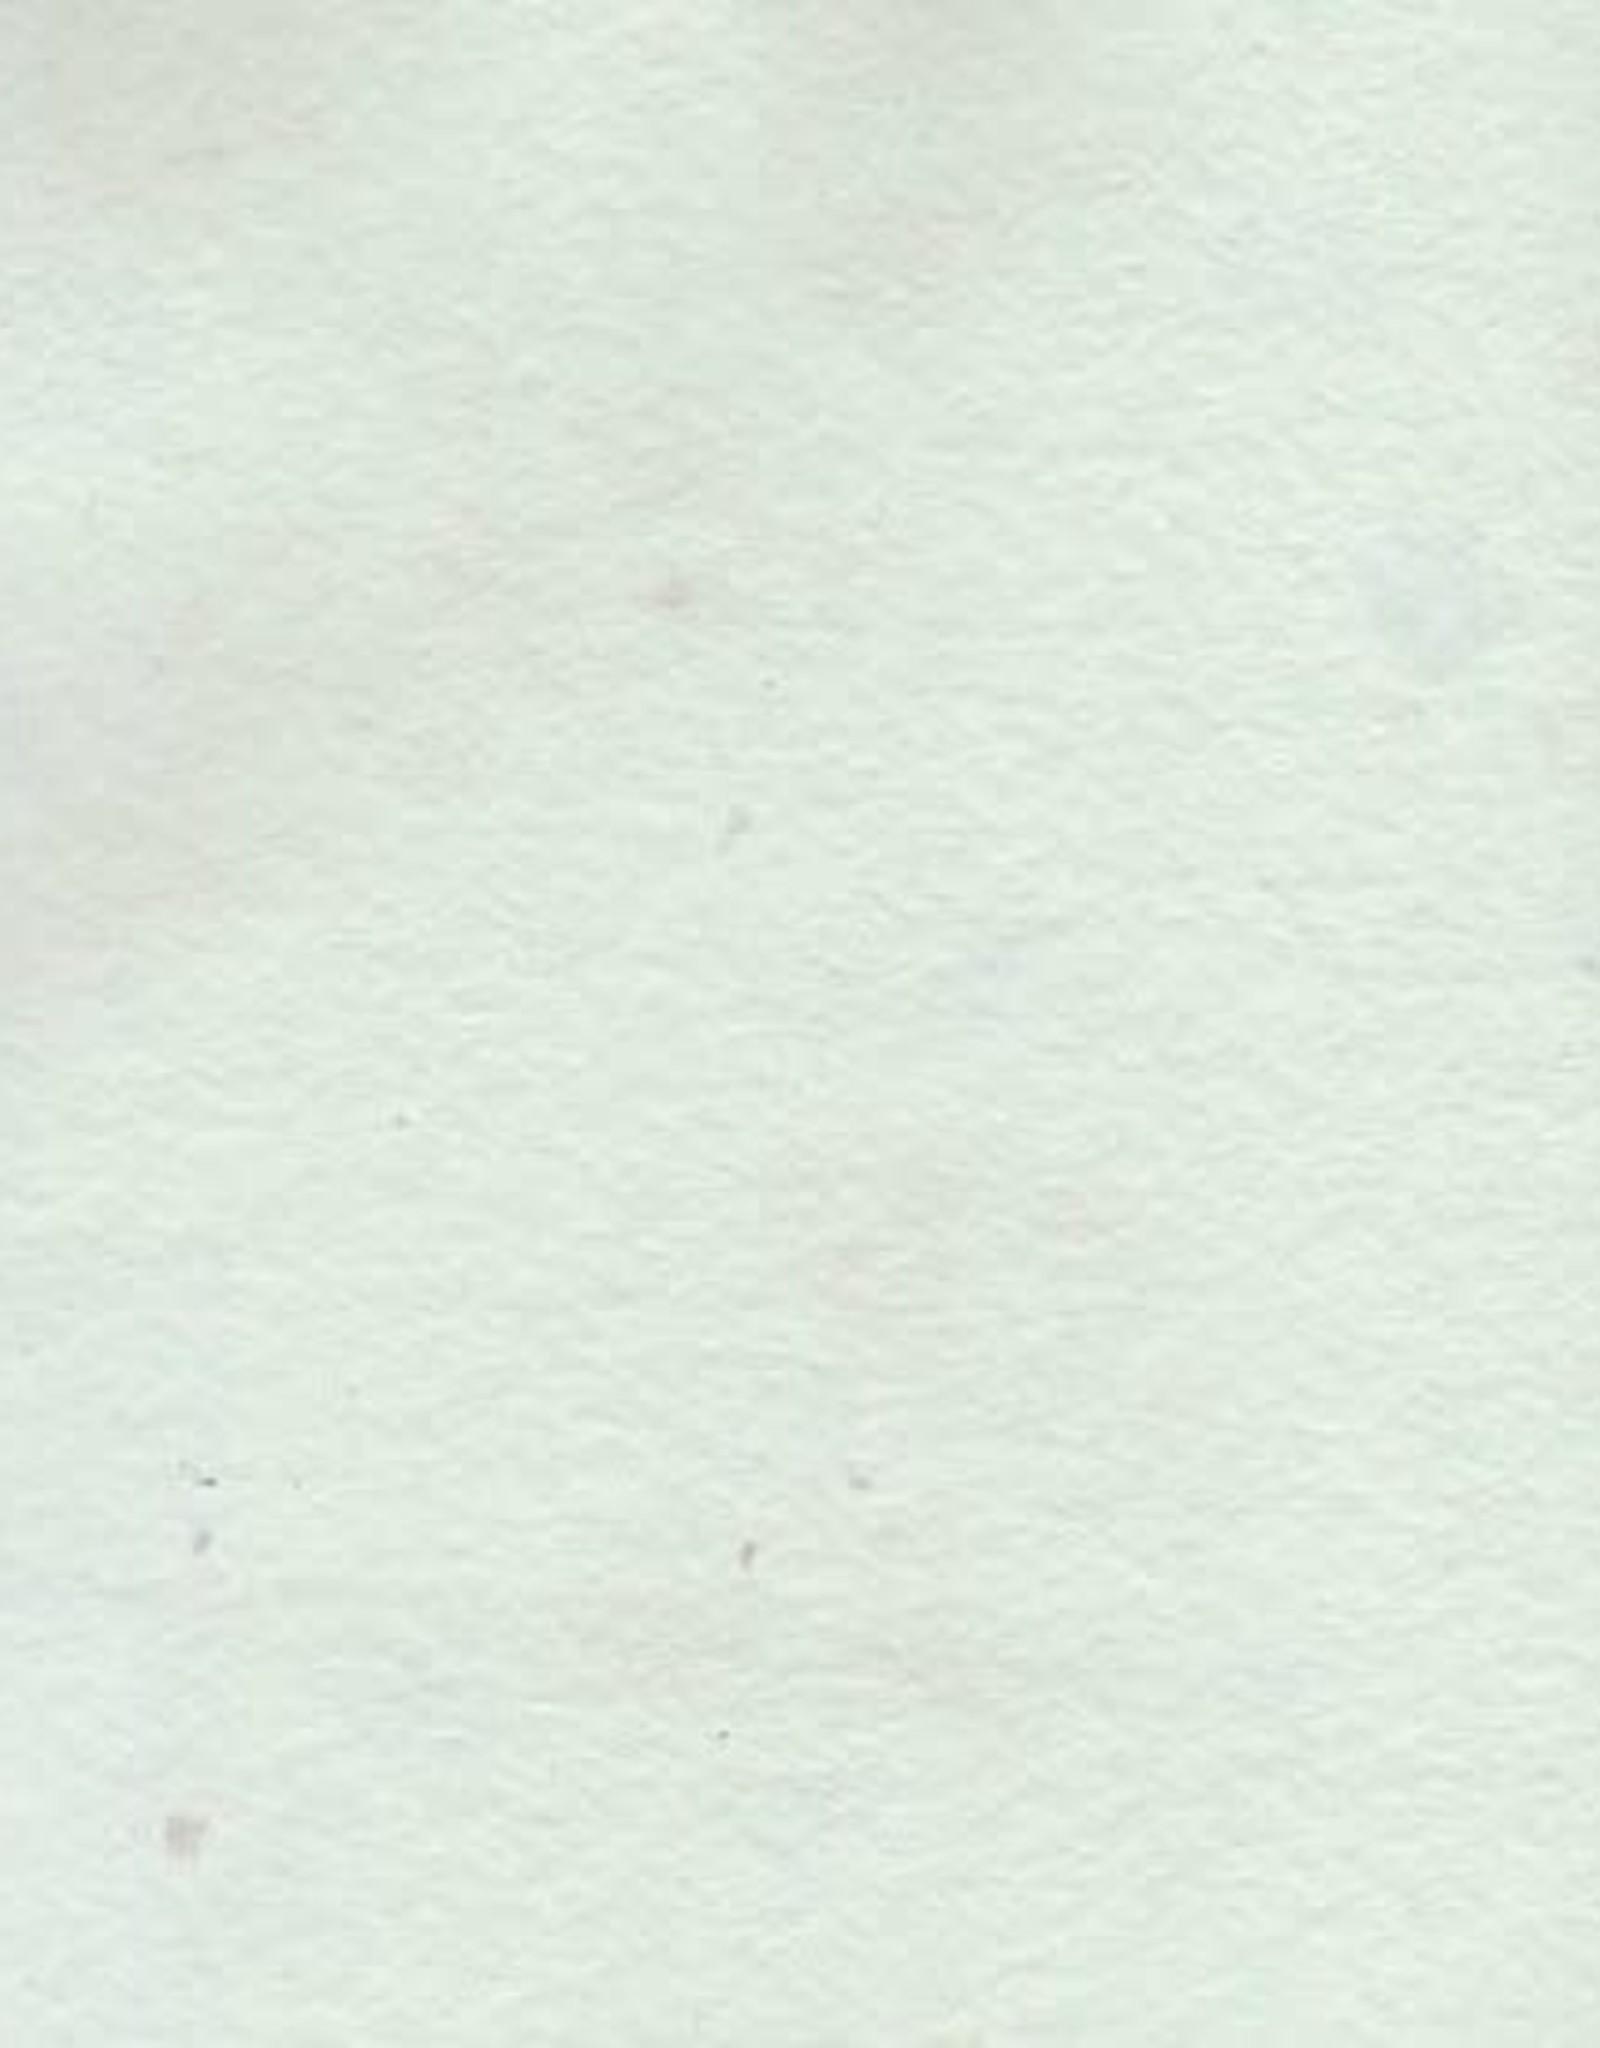 Katoen Papier A4 5 stuks